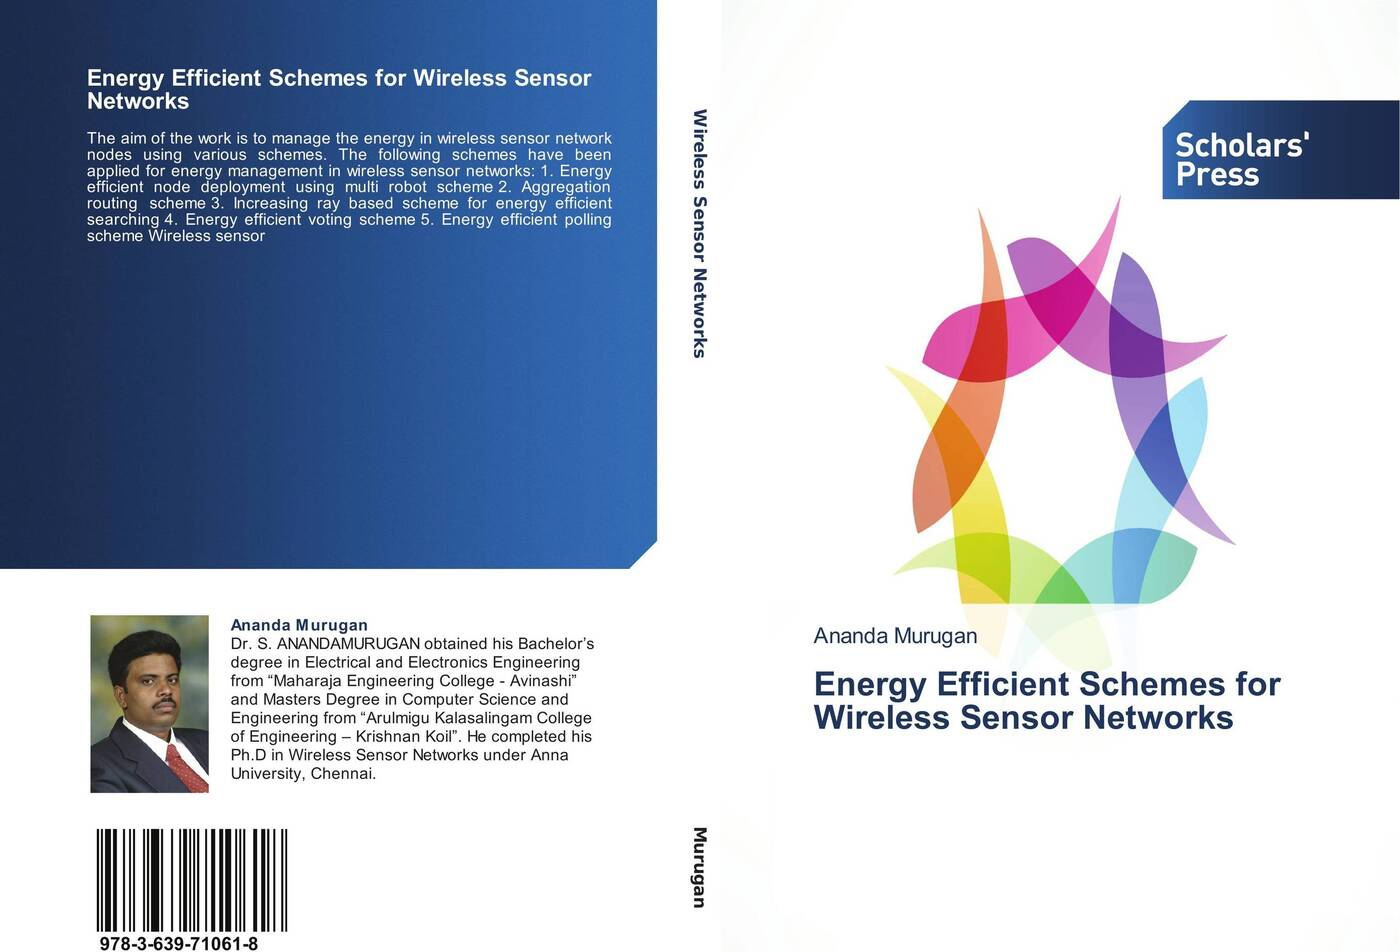 Ananda Murugan Energy Efficient Schemes for Wireless Sensor Networks localization in wireless sensor network